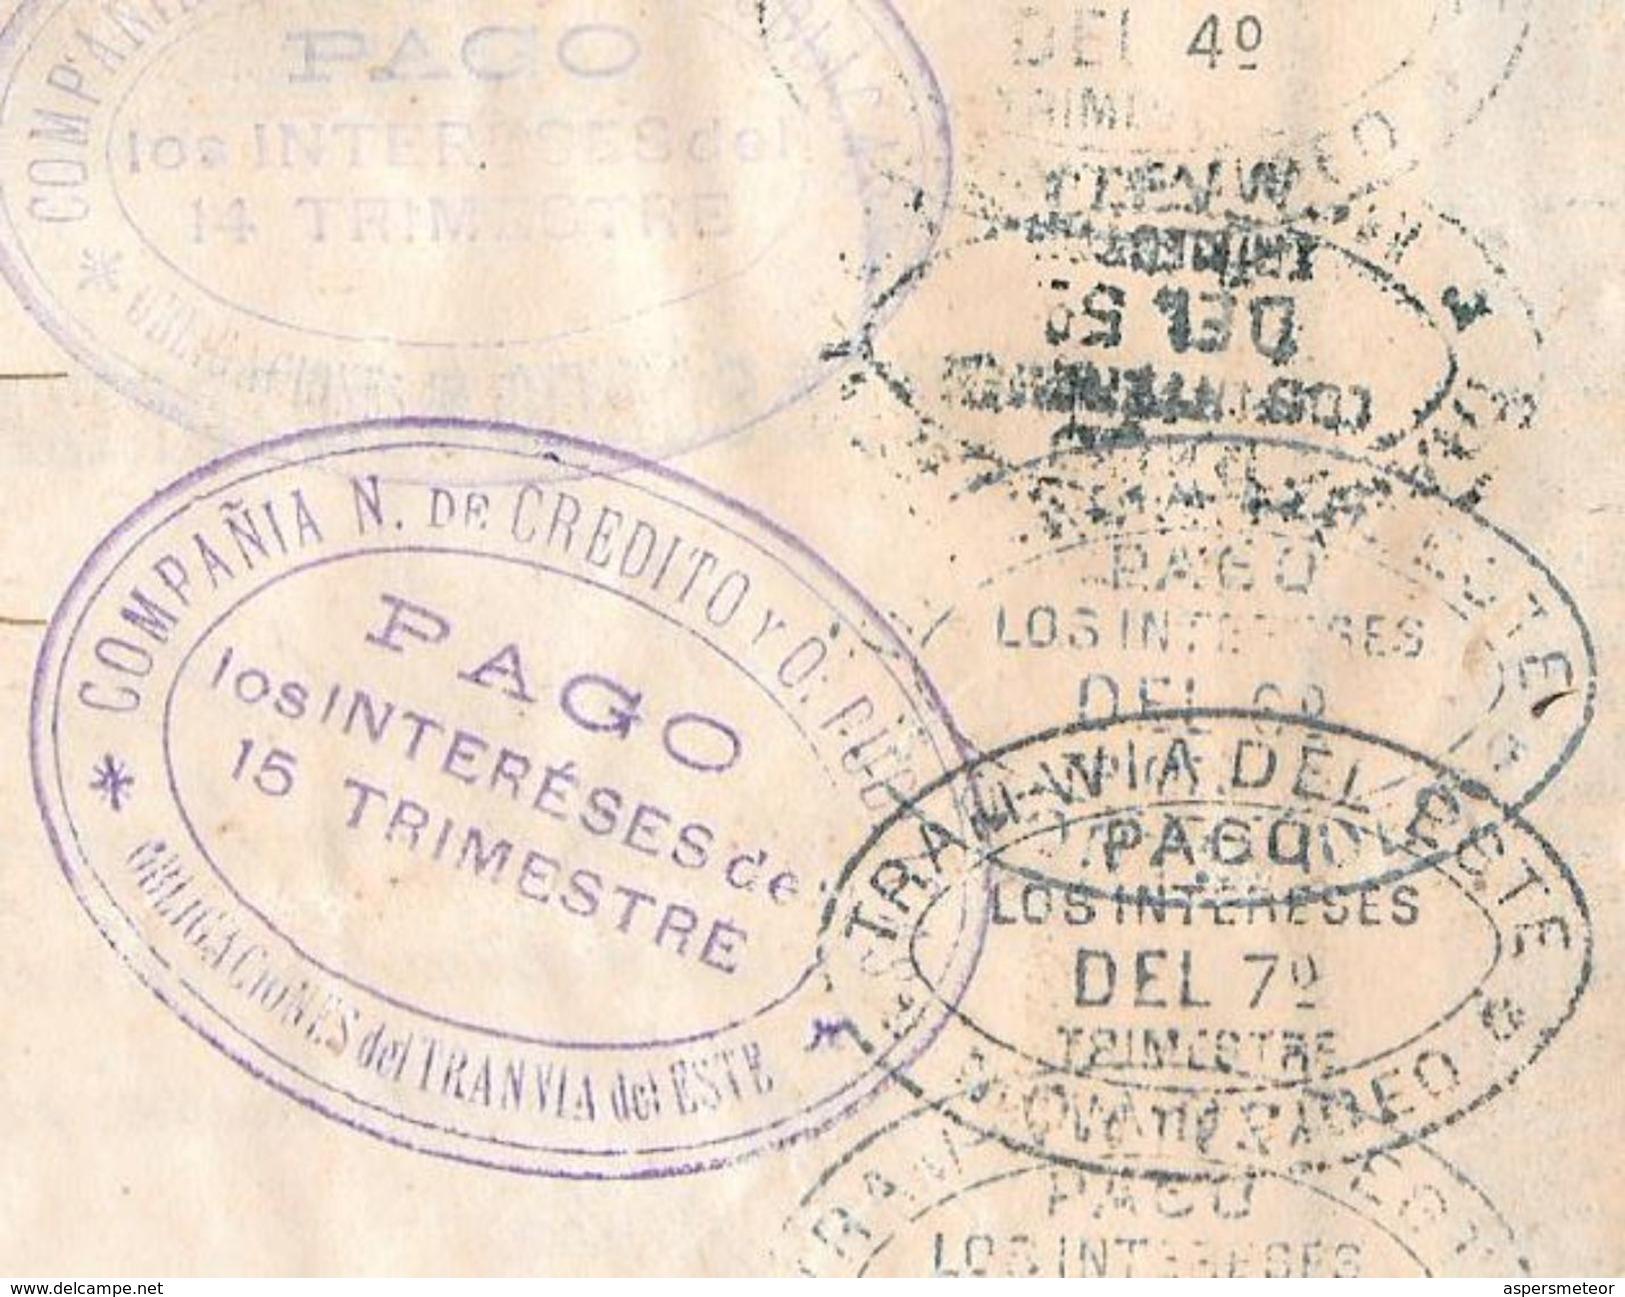 TRAM-VIA DEL ESTE MONTEVIDEO URUGUAY AÑO 1885 OBLIGACION HIPOTECARIA TRAMWAY TRAMWAYS RARISIME TRAM TROLLEY - Transporte